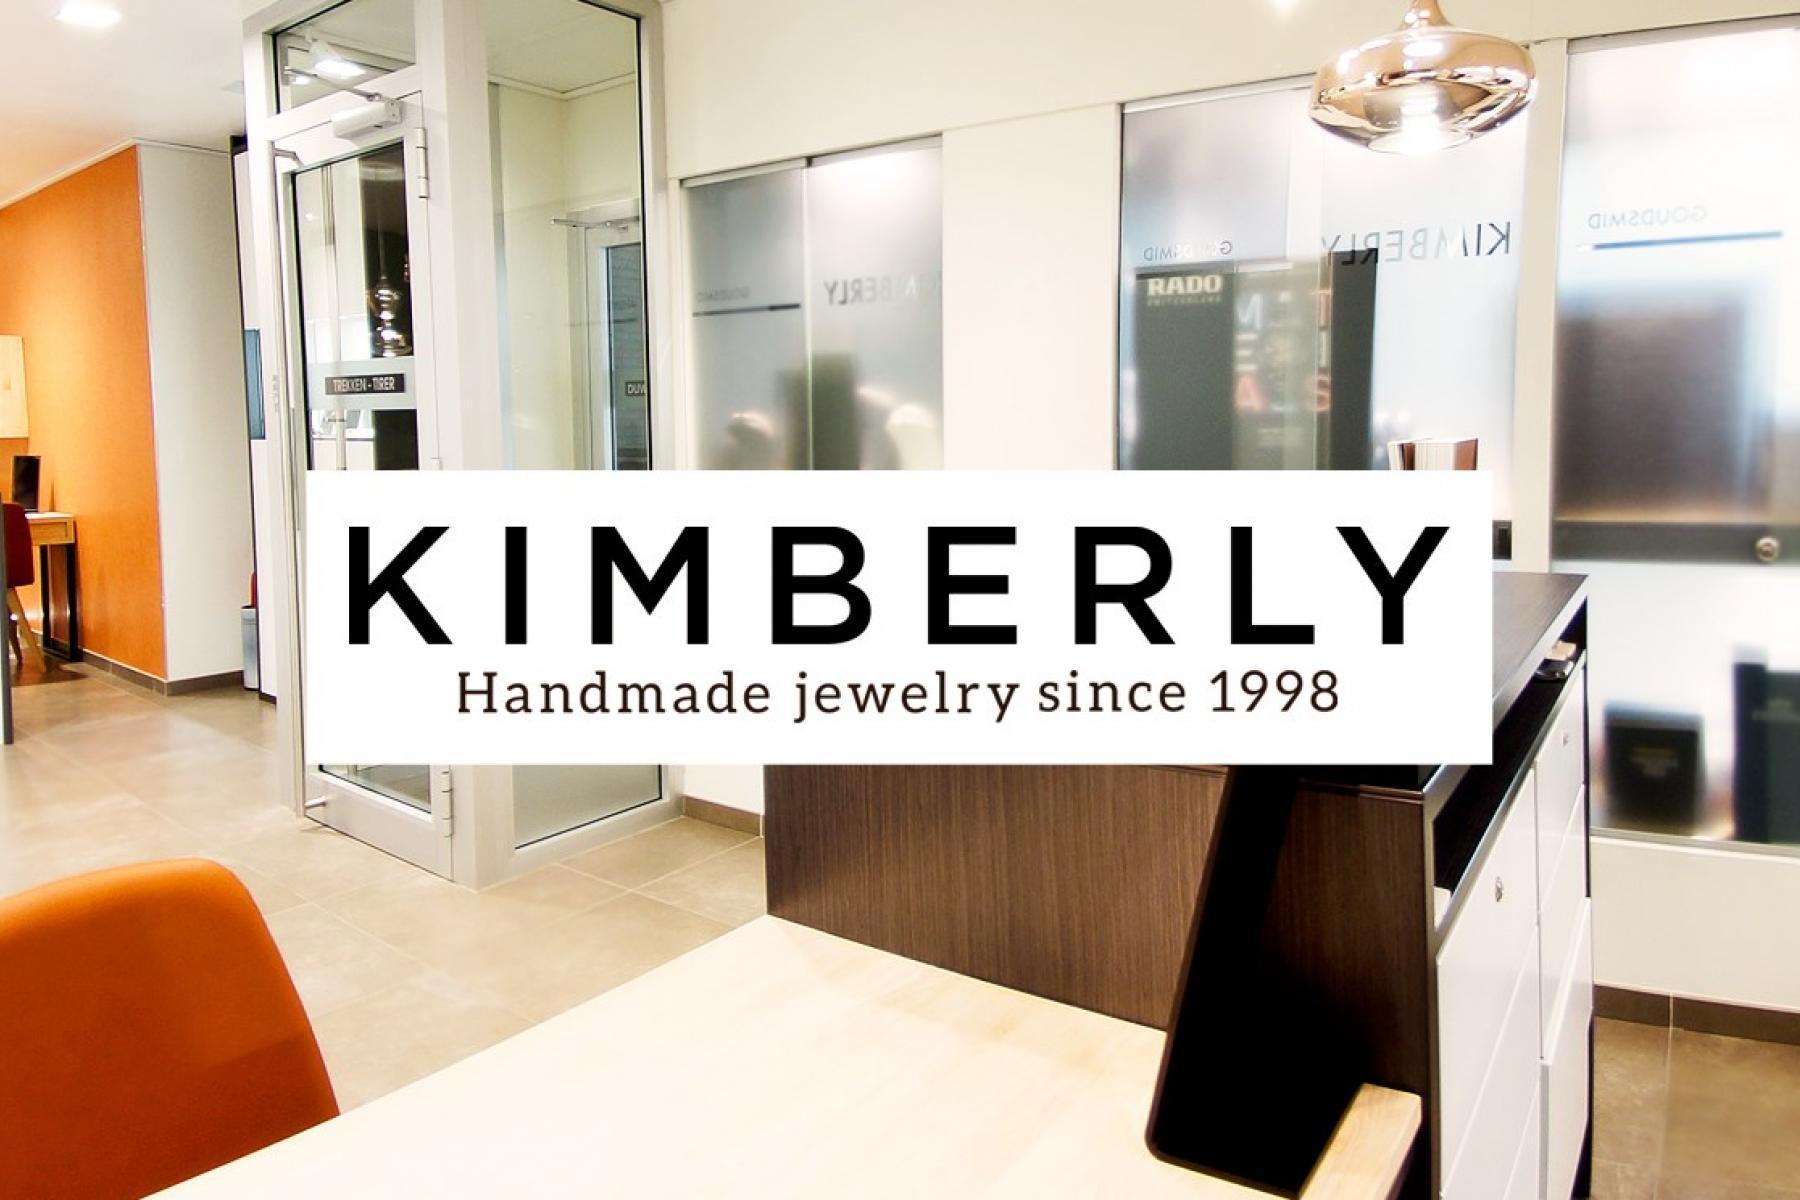 Visit-Nieuwpoort Juwelen Kimberly